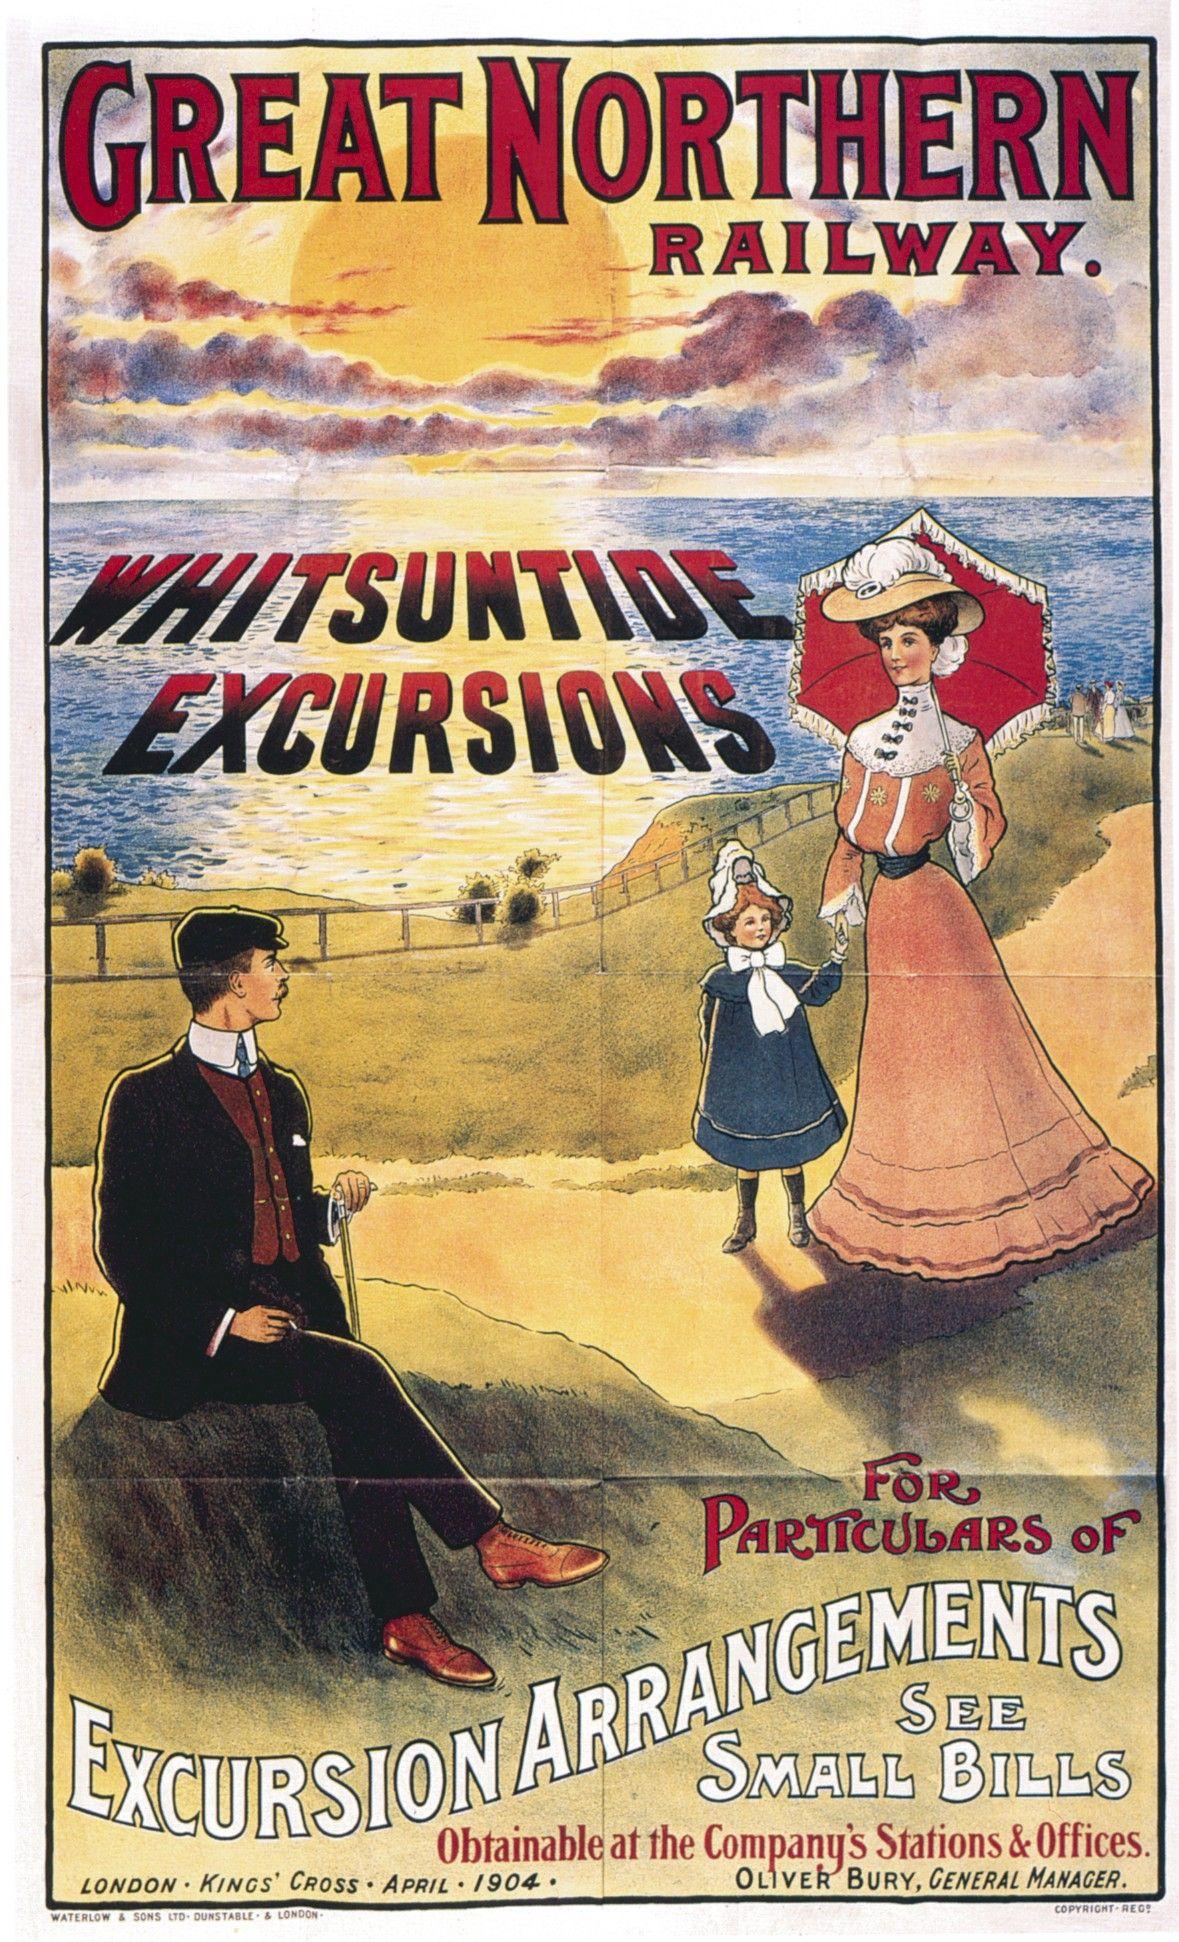 1911 Central London England Railway Art Travel Advertisement Poster Print